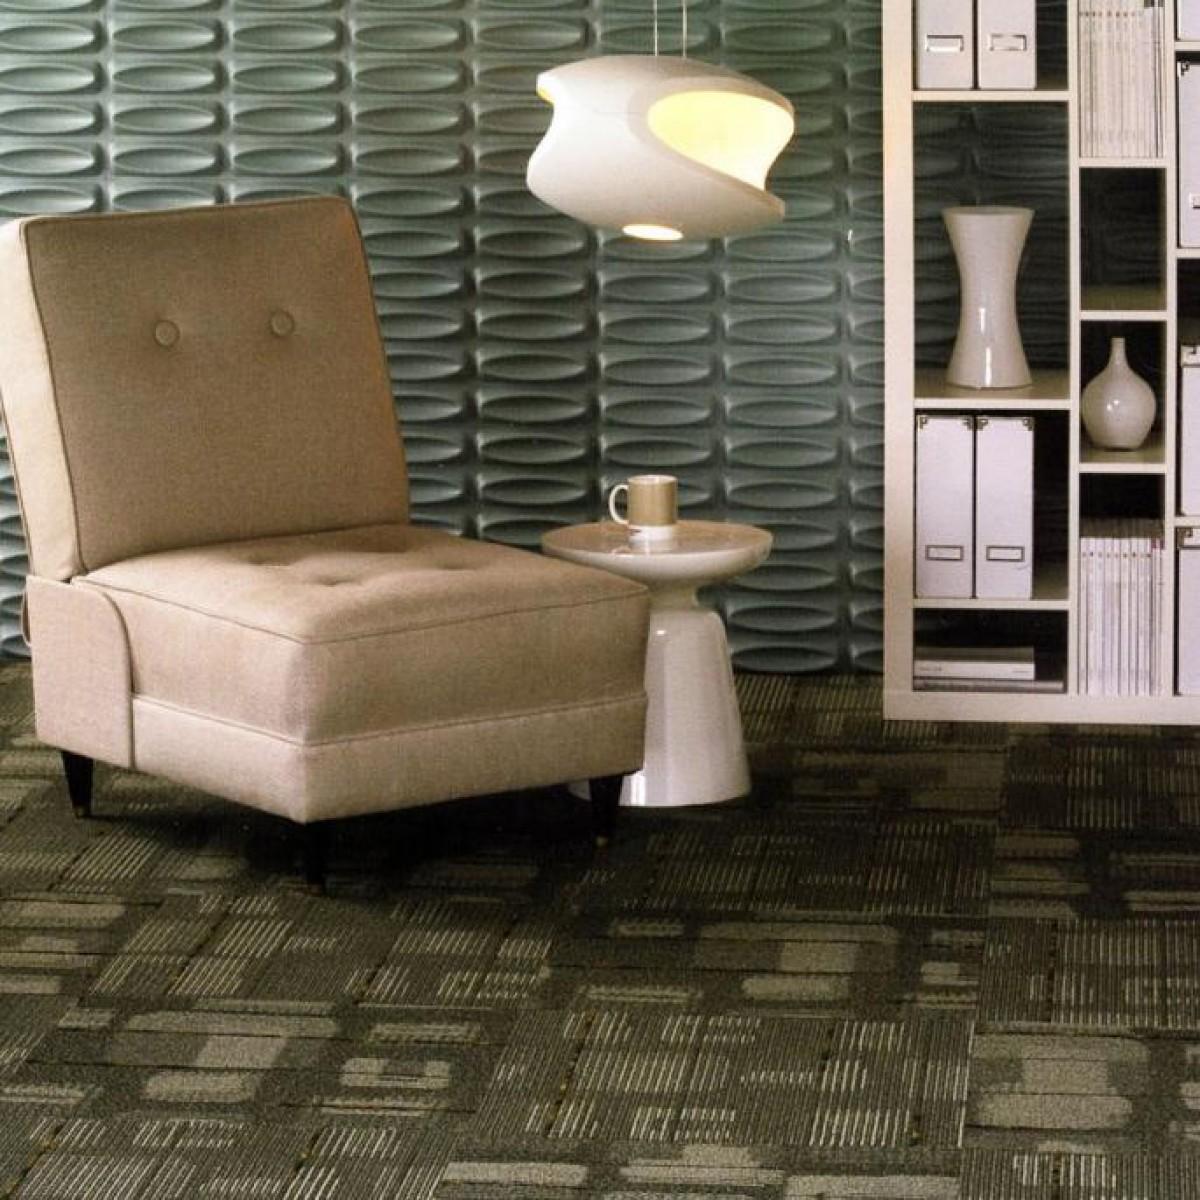 Box Wall Panels : Architect pattern design d glue on wall panel